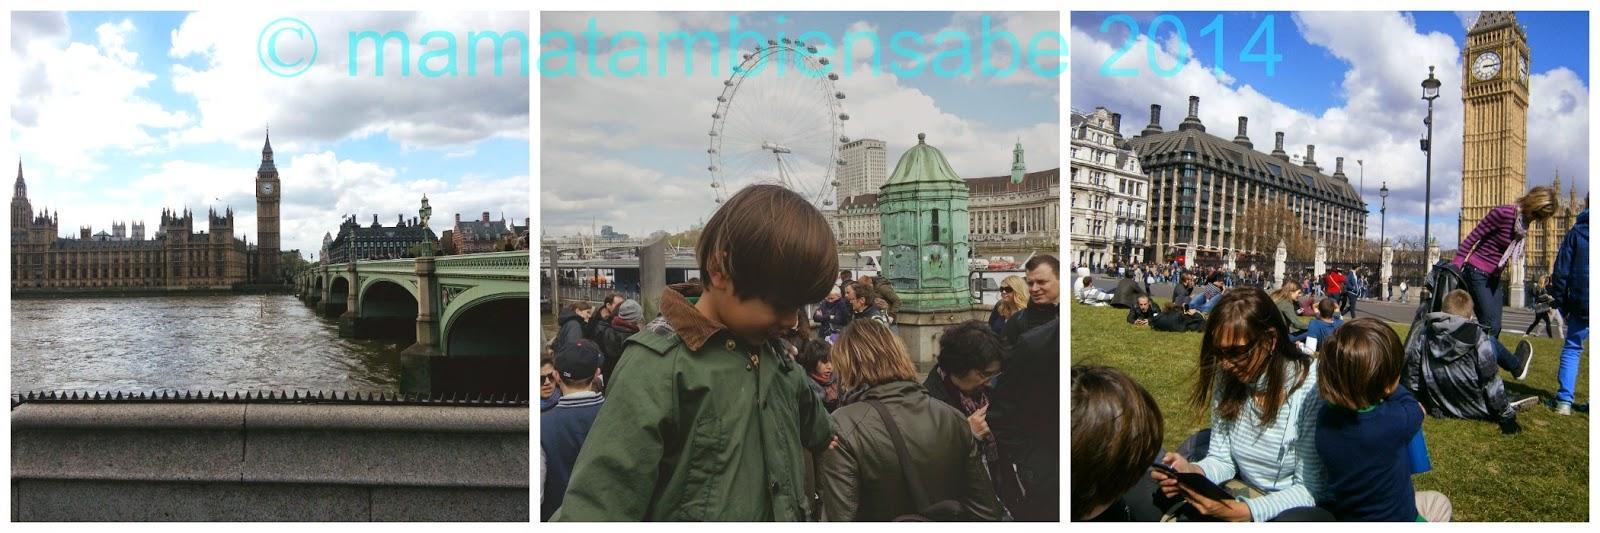 Londres embankment